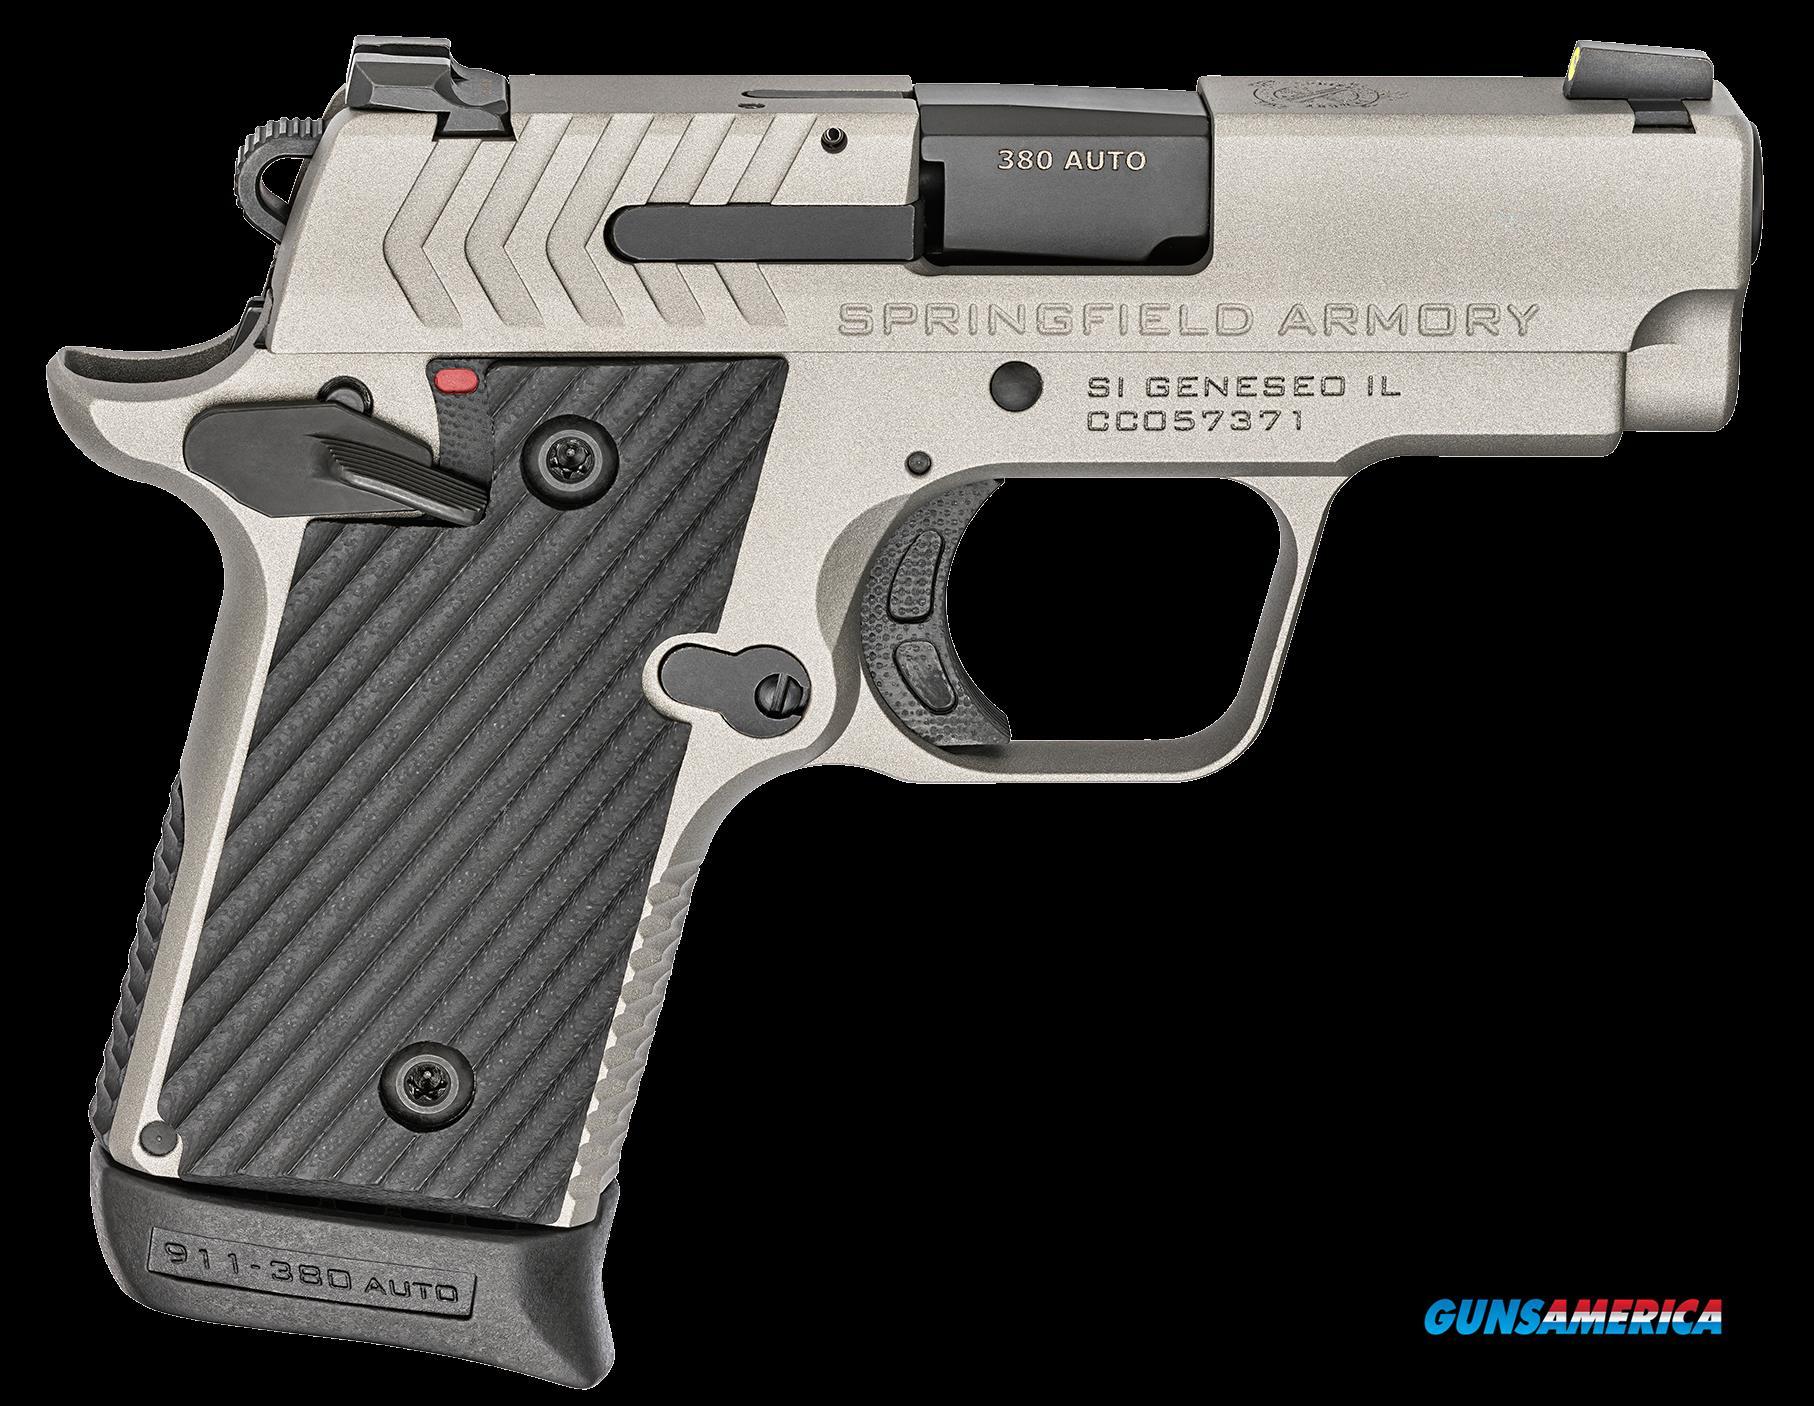 Springfield Armory 911, Spg Pg9109t       380 911 2.7 Titanium       6-7r  Guns > Pistols > 1911 Pistol Copies (non-Colt)